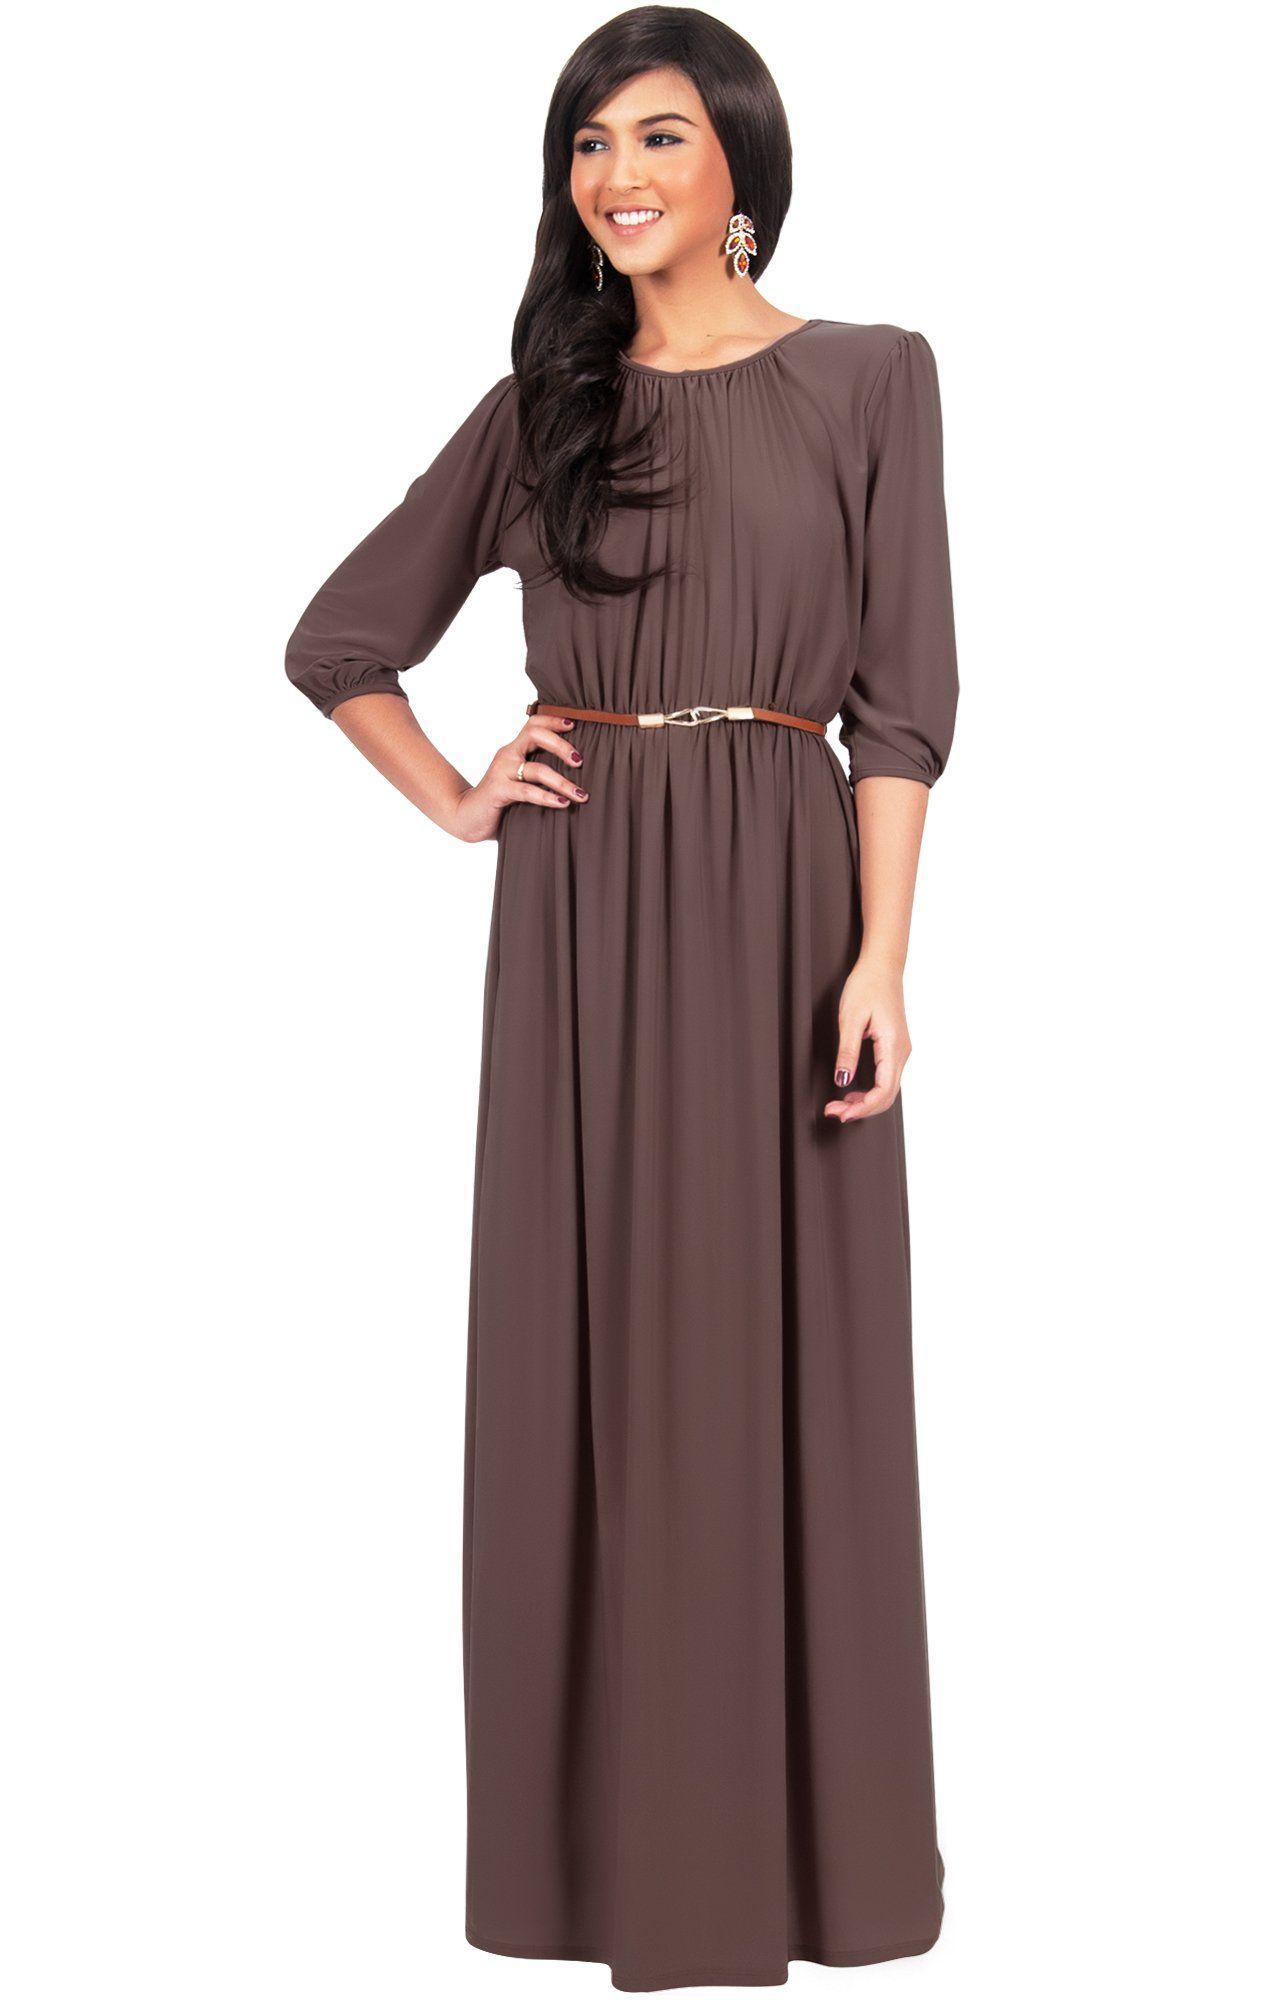 Maternity styles prim maternity dresses koh koh women long